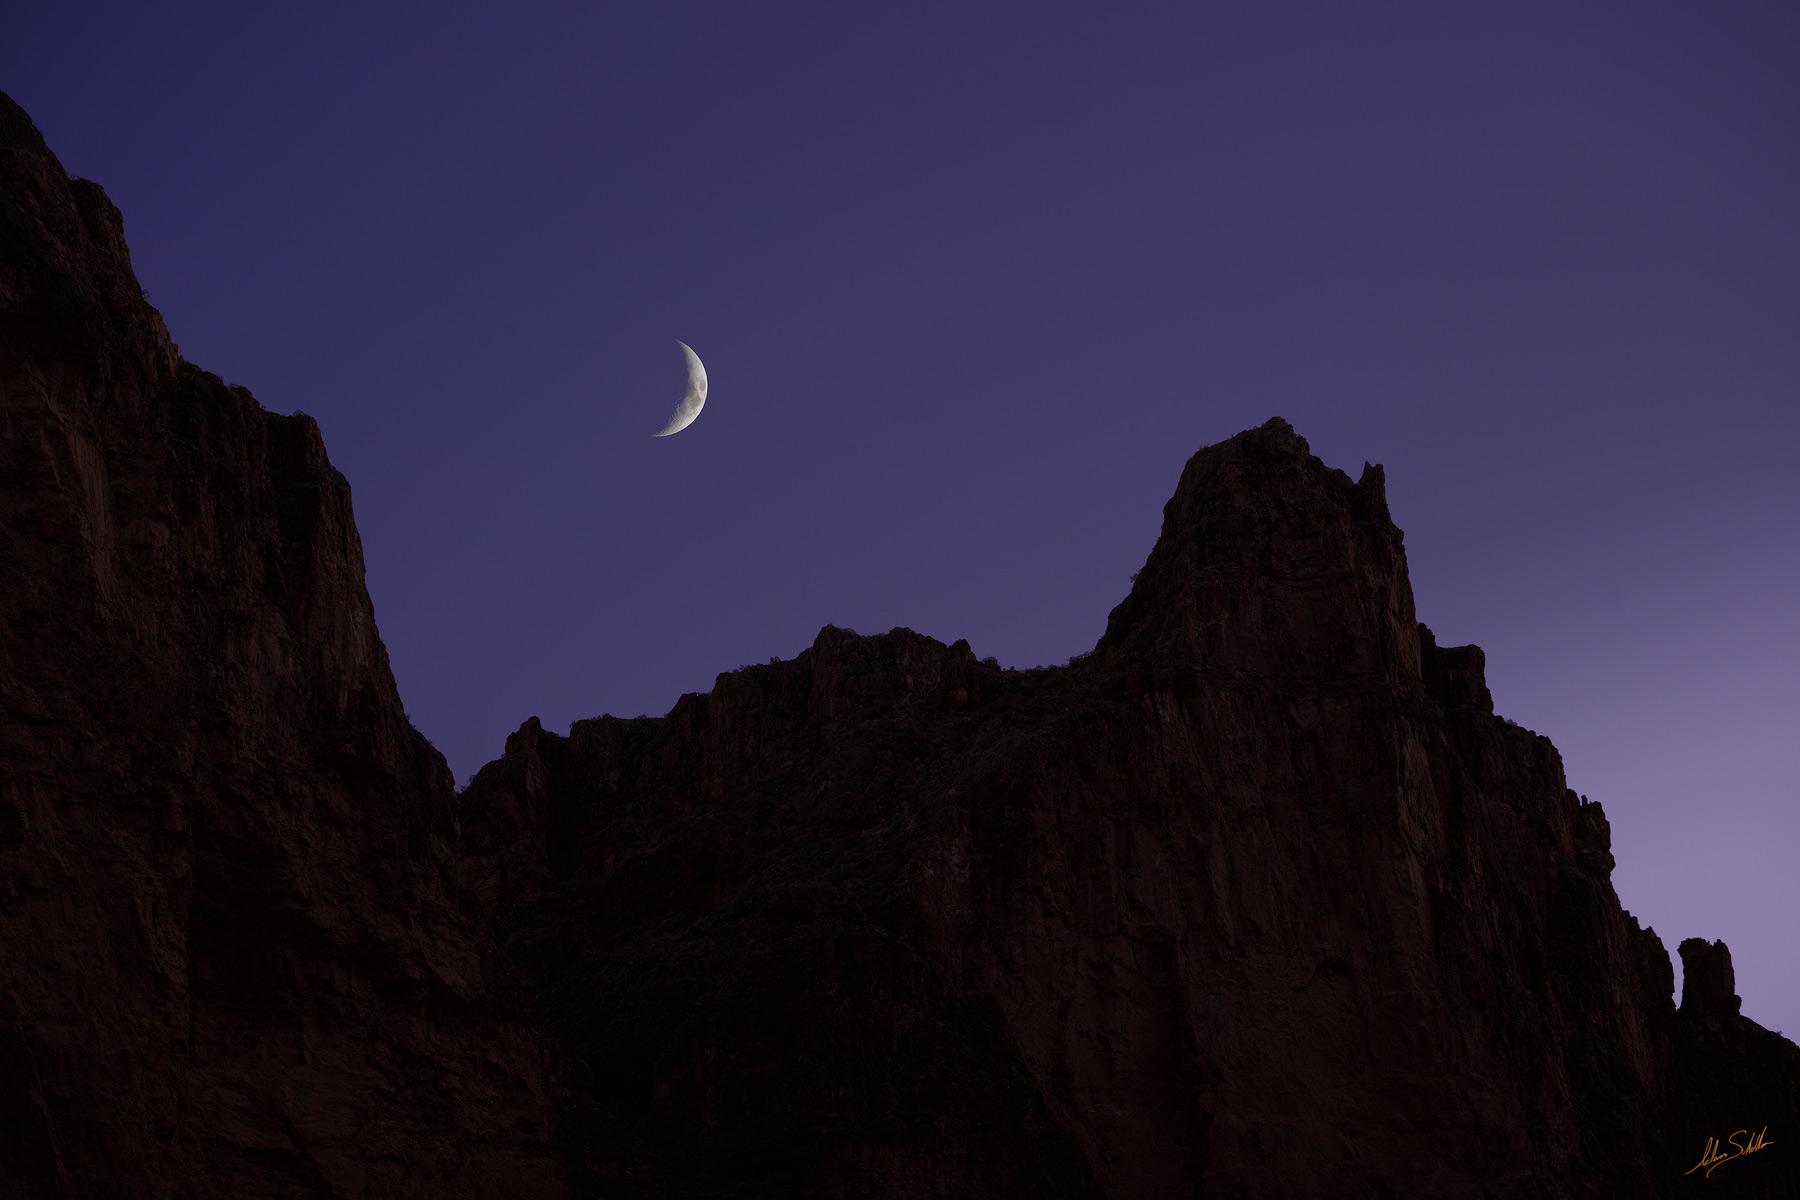 Arizona, Below the Rim, Colorado River, Crescent Moon, Grand Canyon, Grand Canyon National Park, Moon, National Park, River Trip, photo